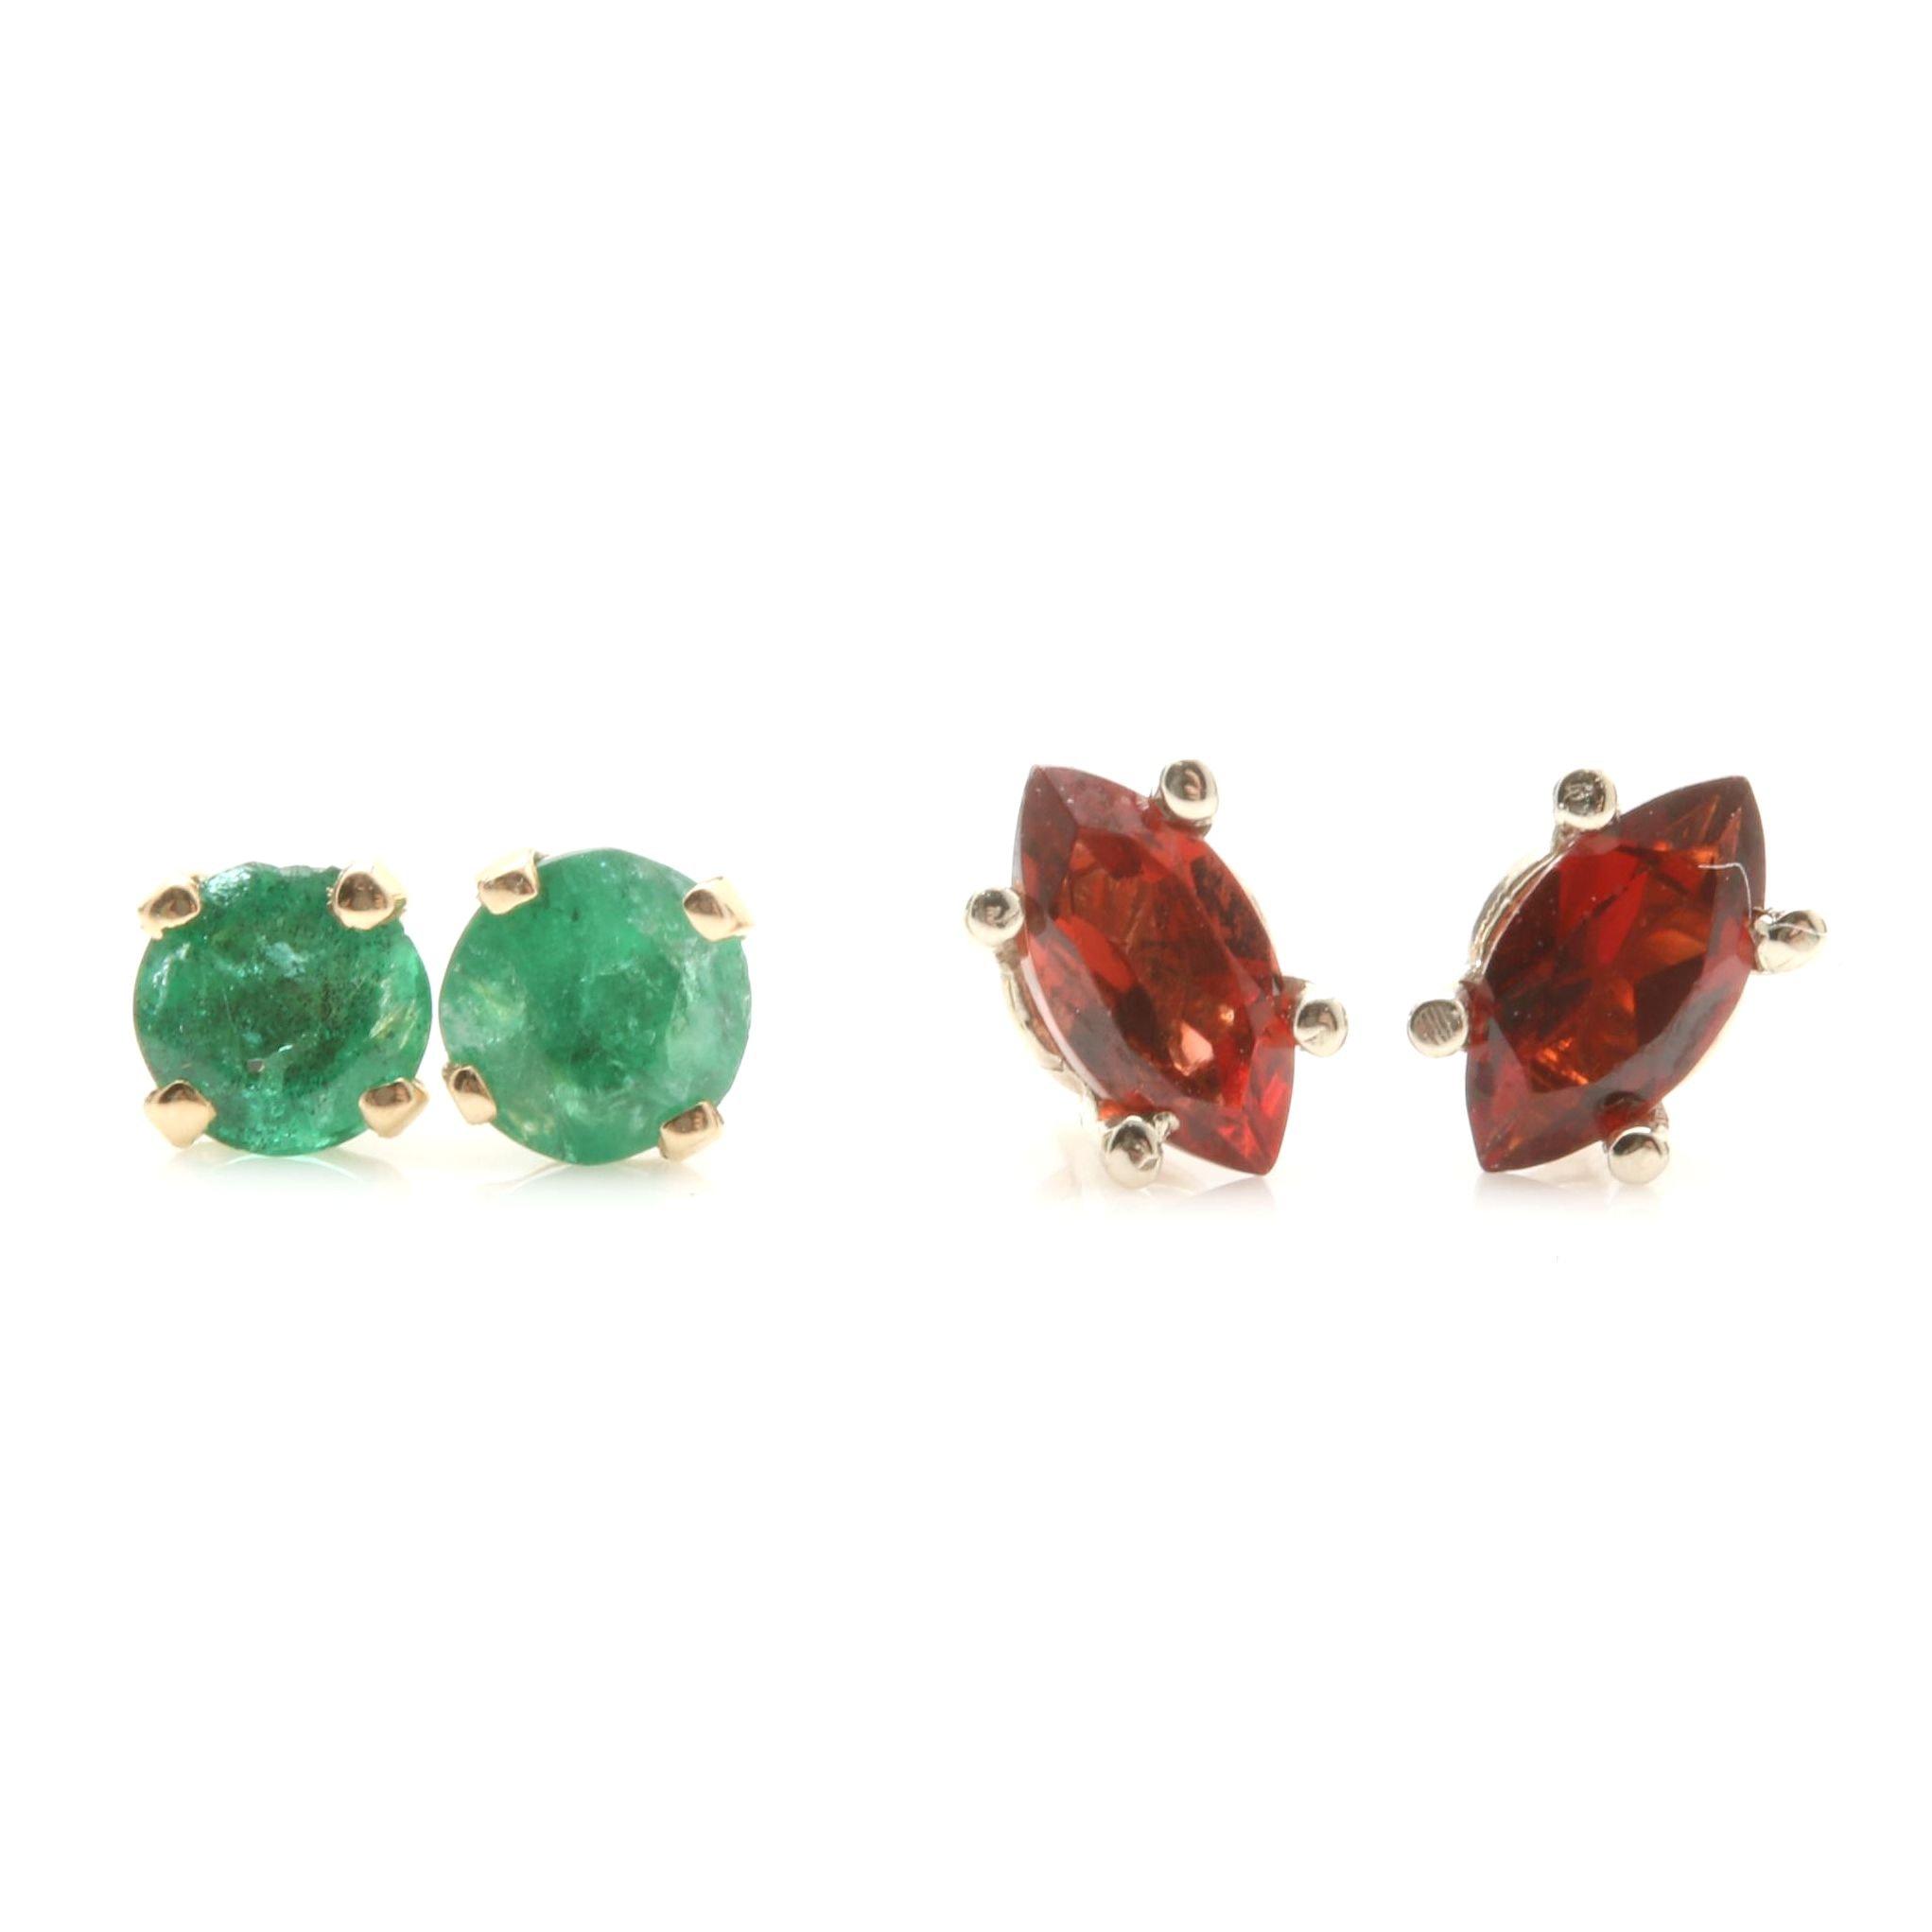 14K Yellow Gold Emerald Earrings and 14K White Gold Garnet Earrings